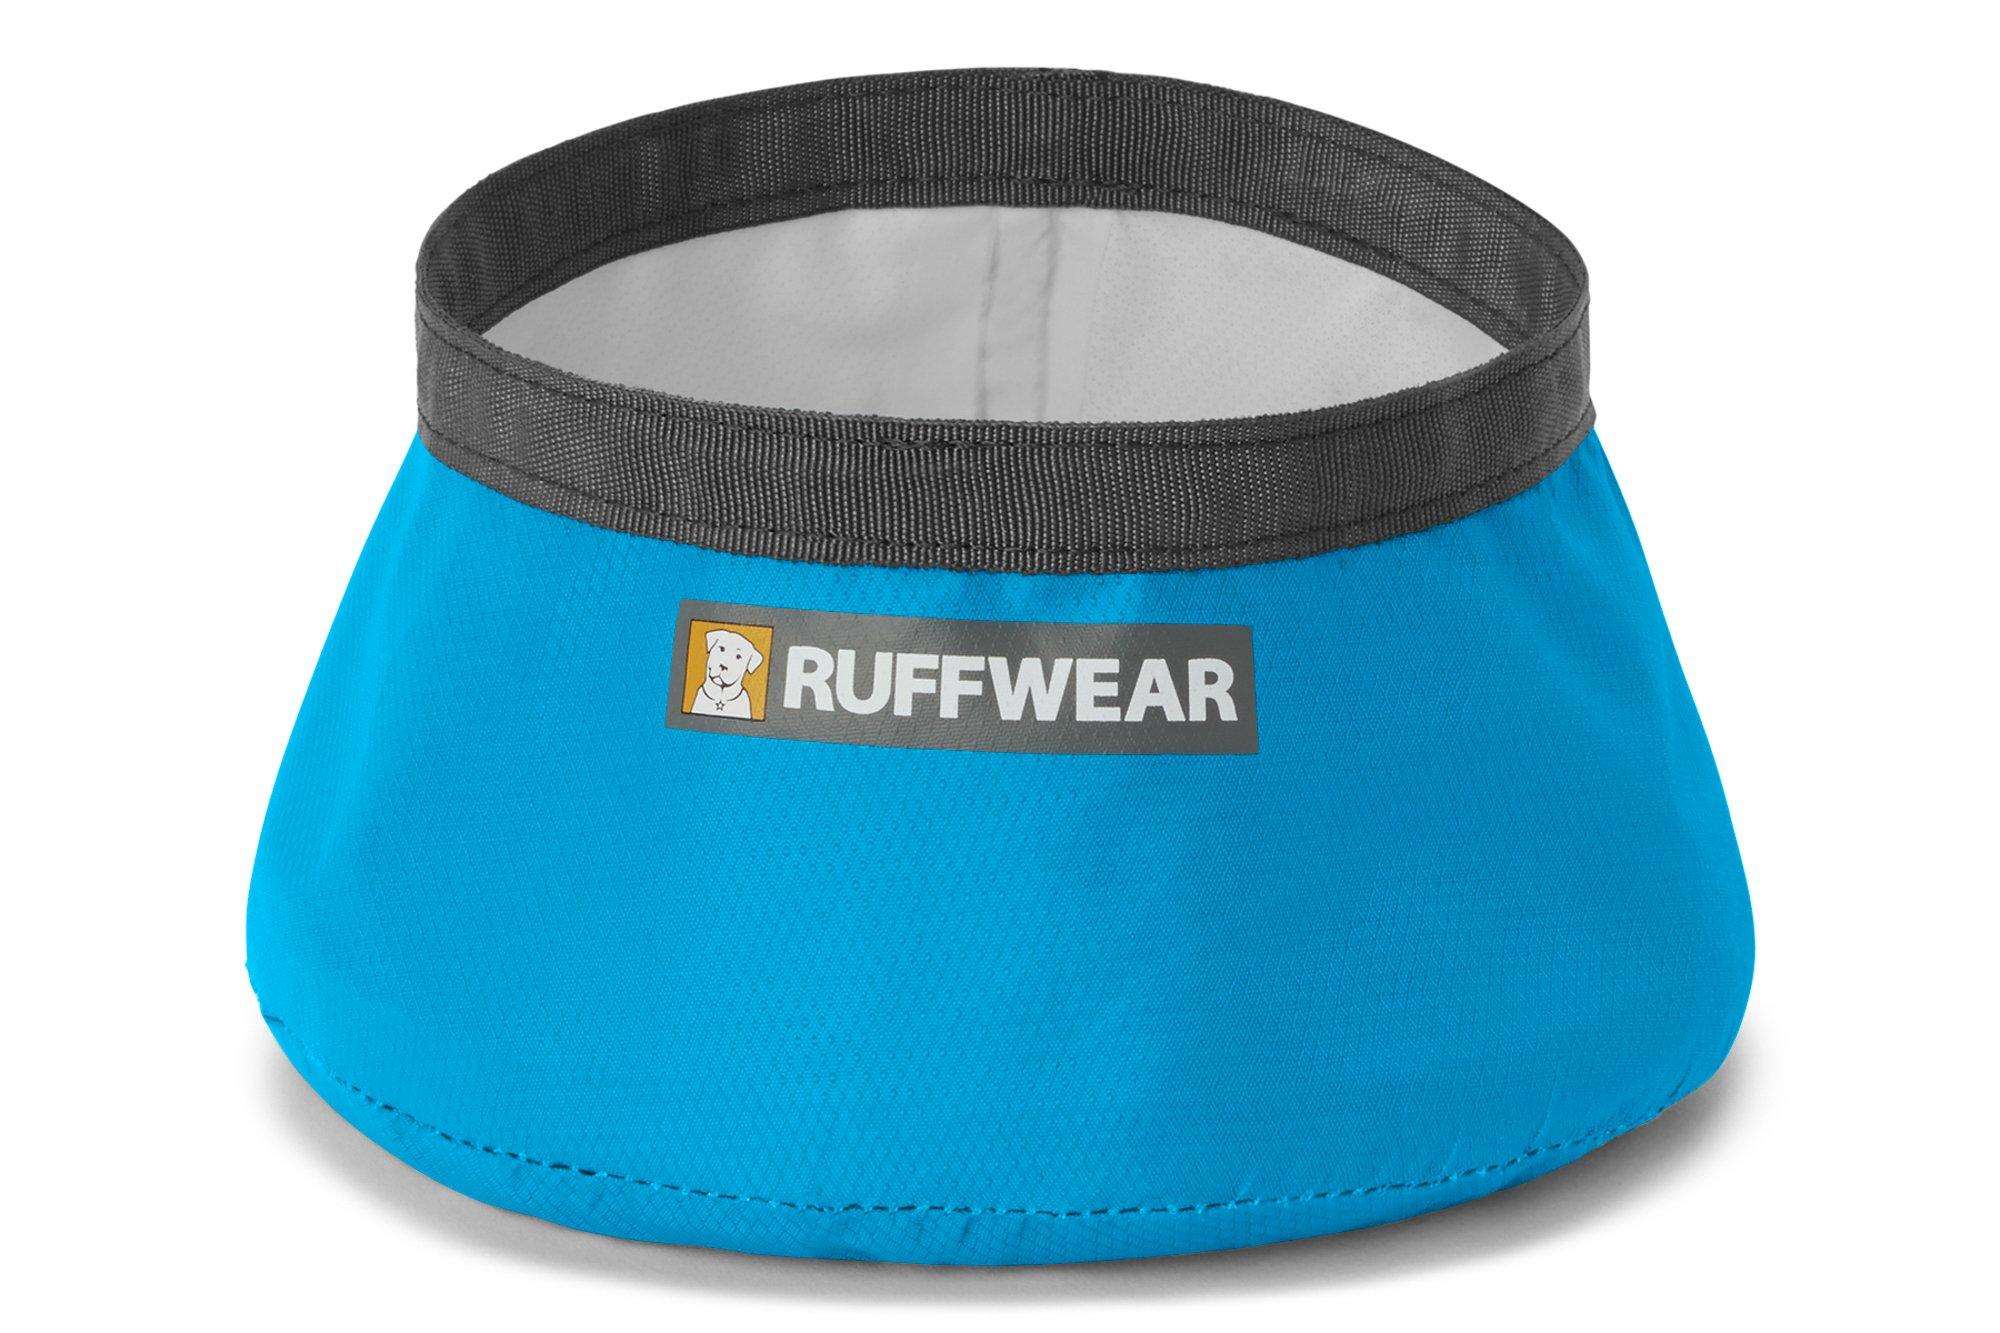 RUFFWEAR - Trail Runner Ultralight Collapsible Dog Bowl, Blue Dusk